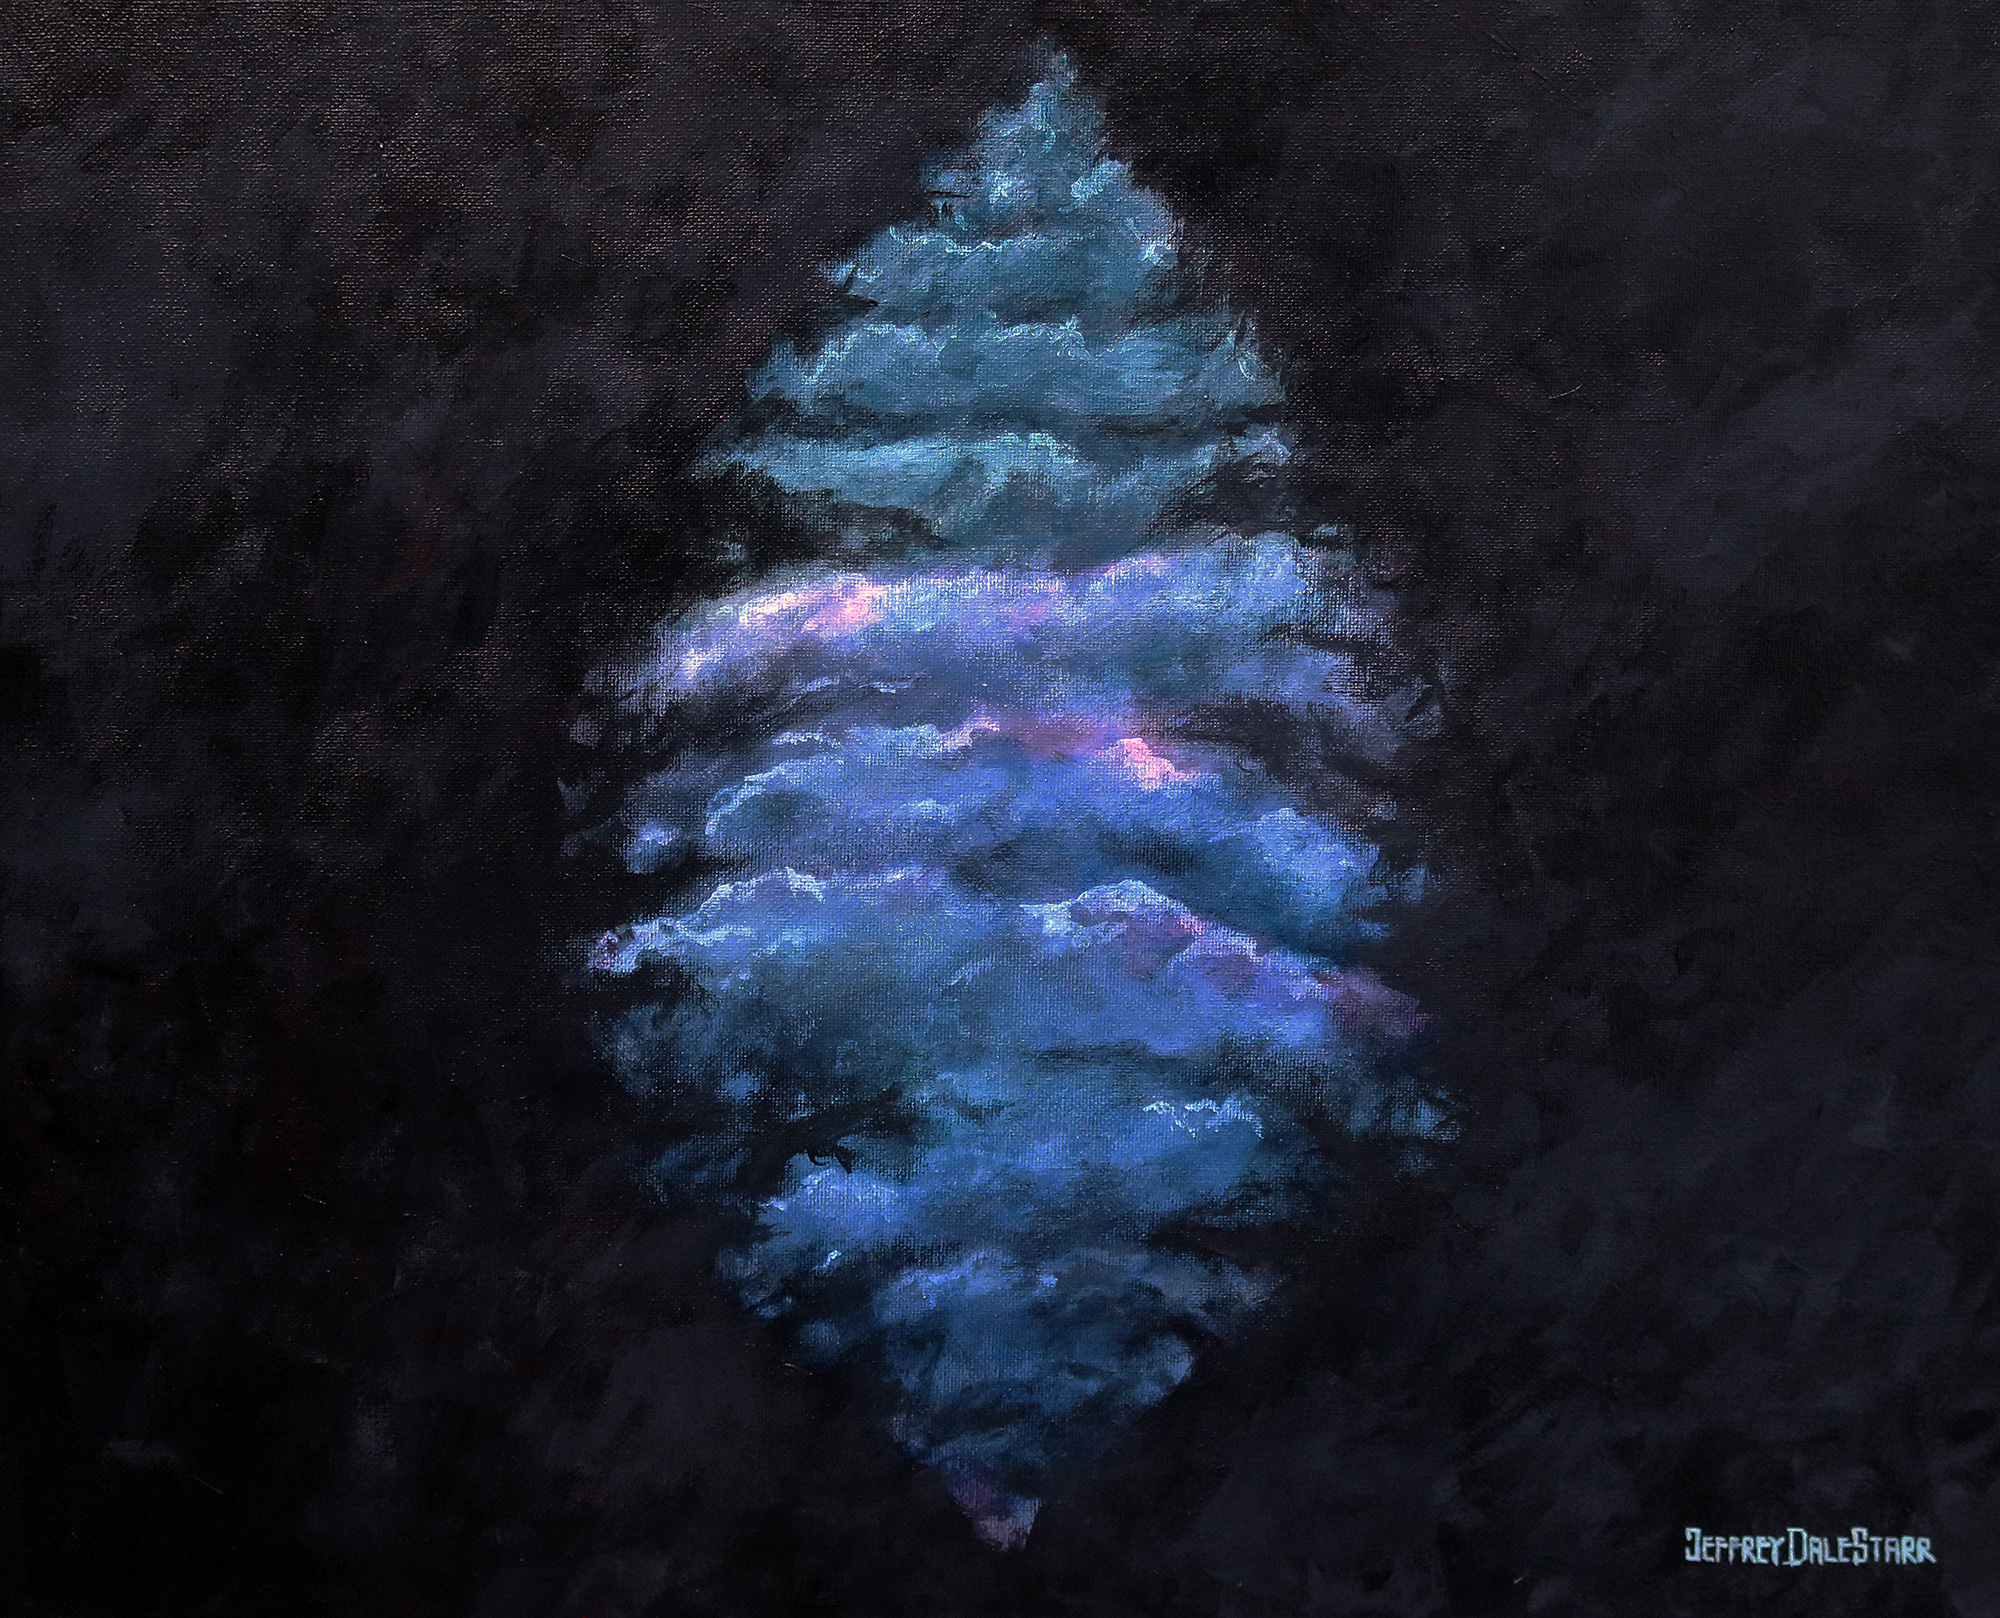 20181111 oil painting of puccini la boheme act I si mi chiamano mimi by american artist jeffrey dale starr